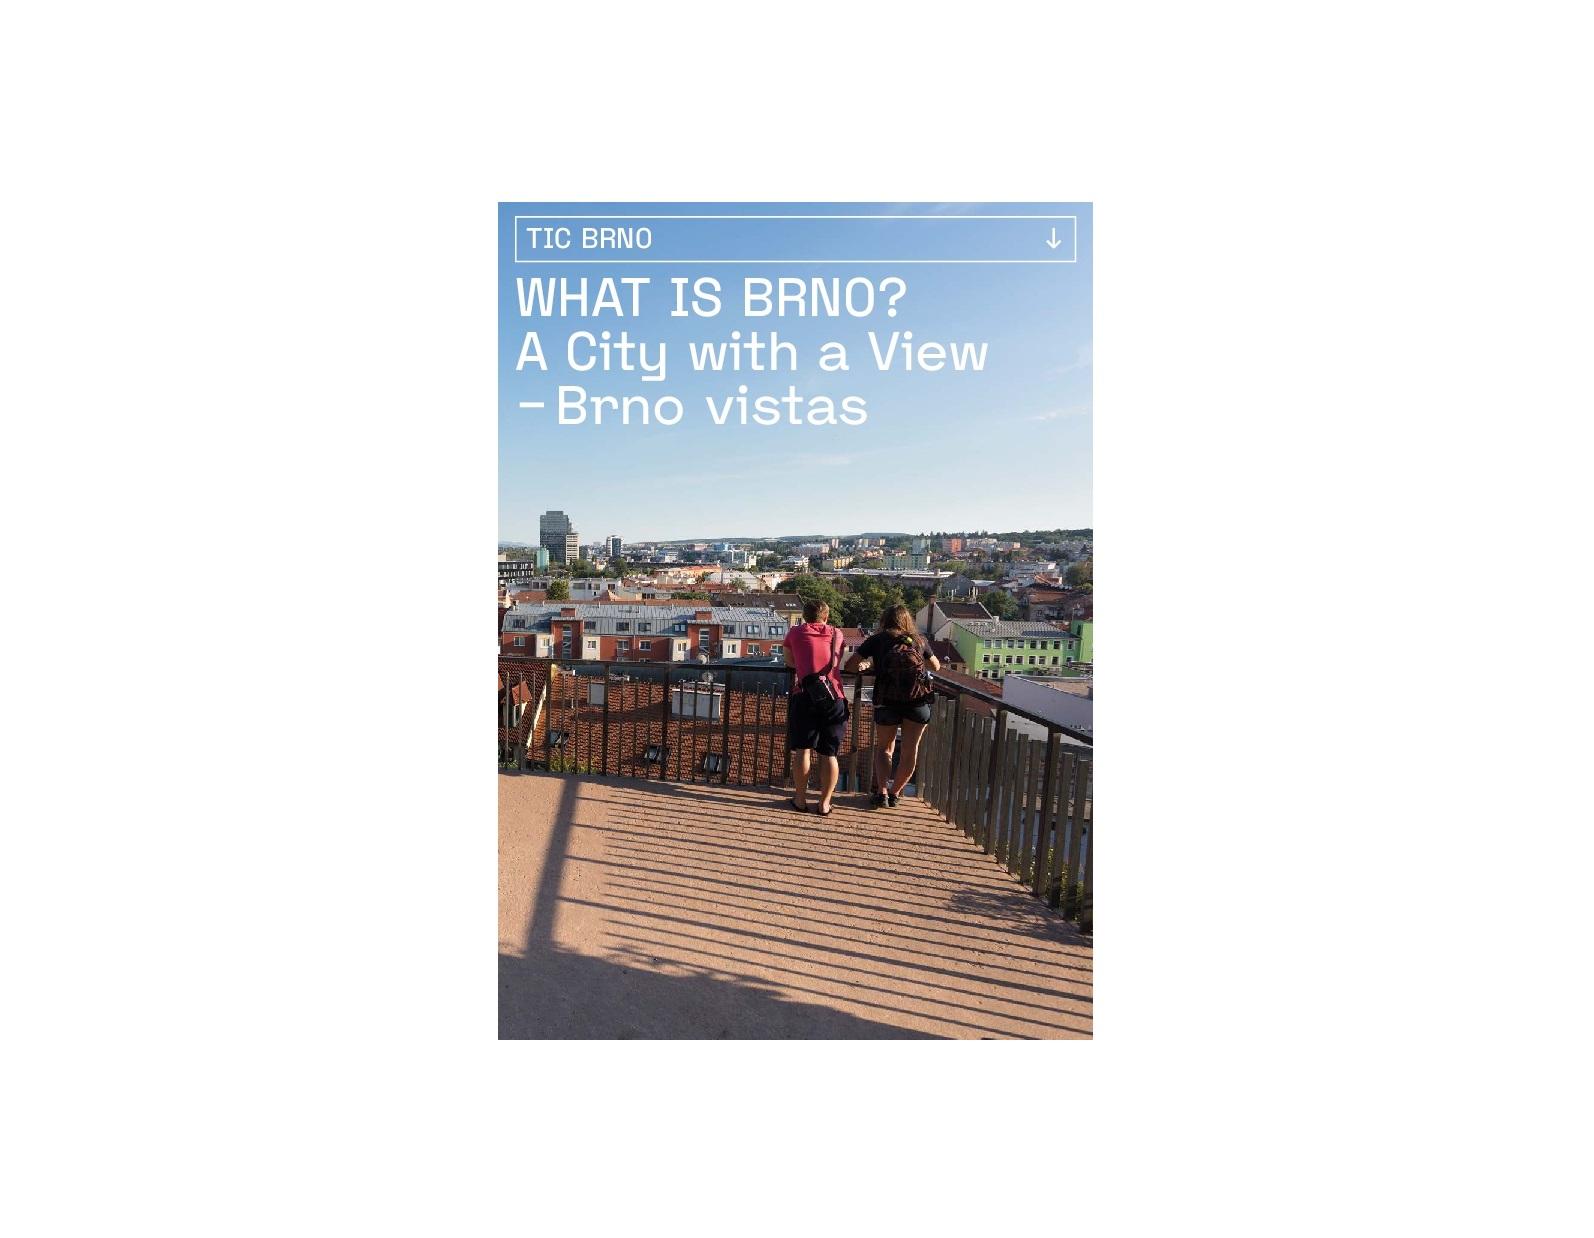 WHAT IS BRNO? A City with a View – Brno vistas